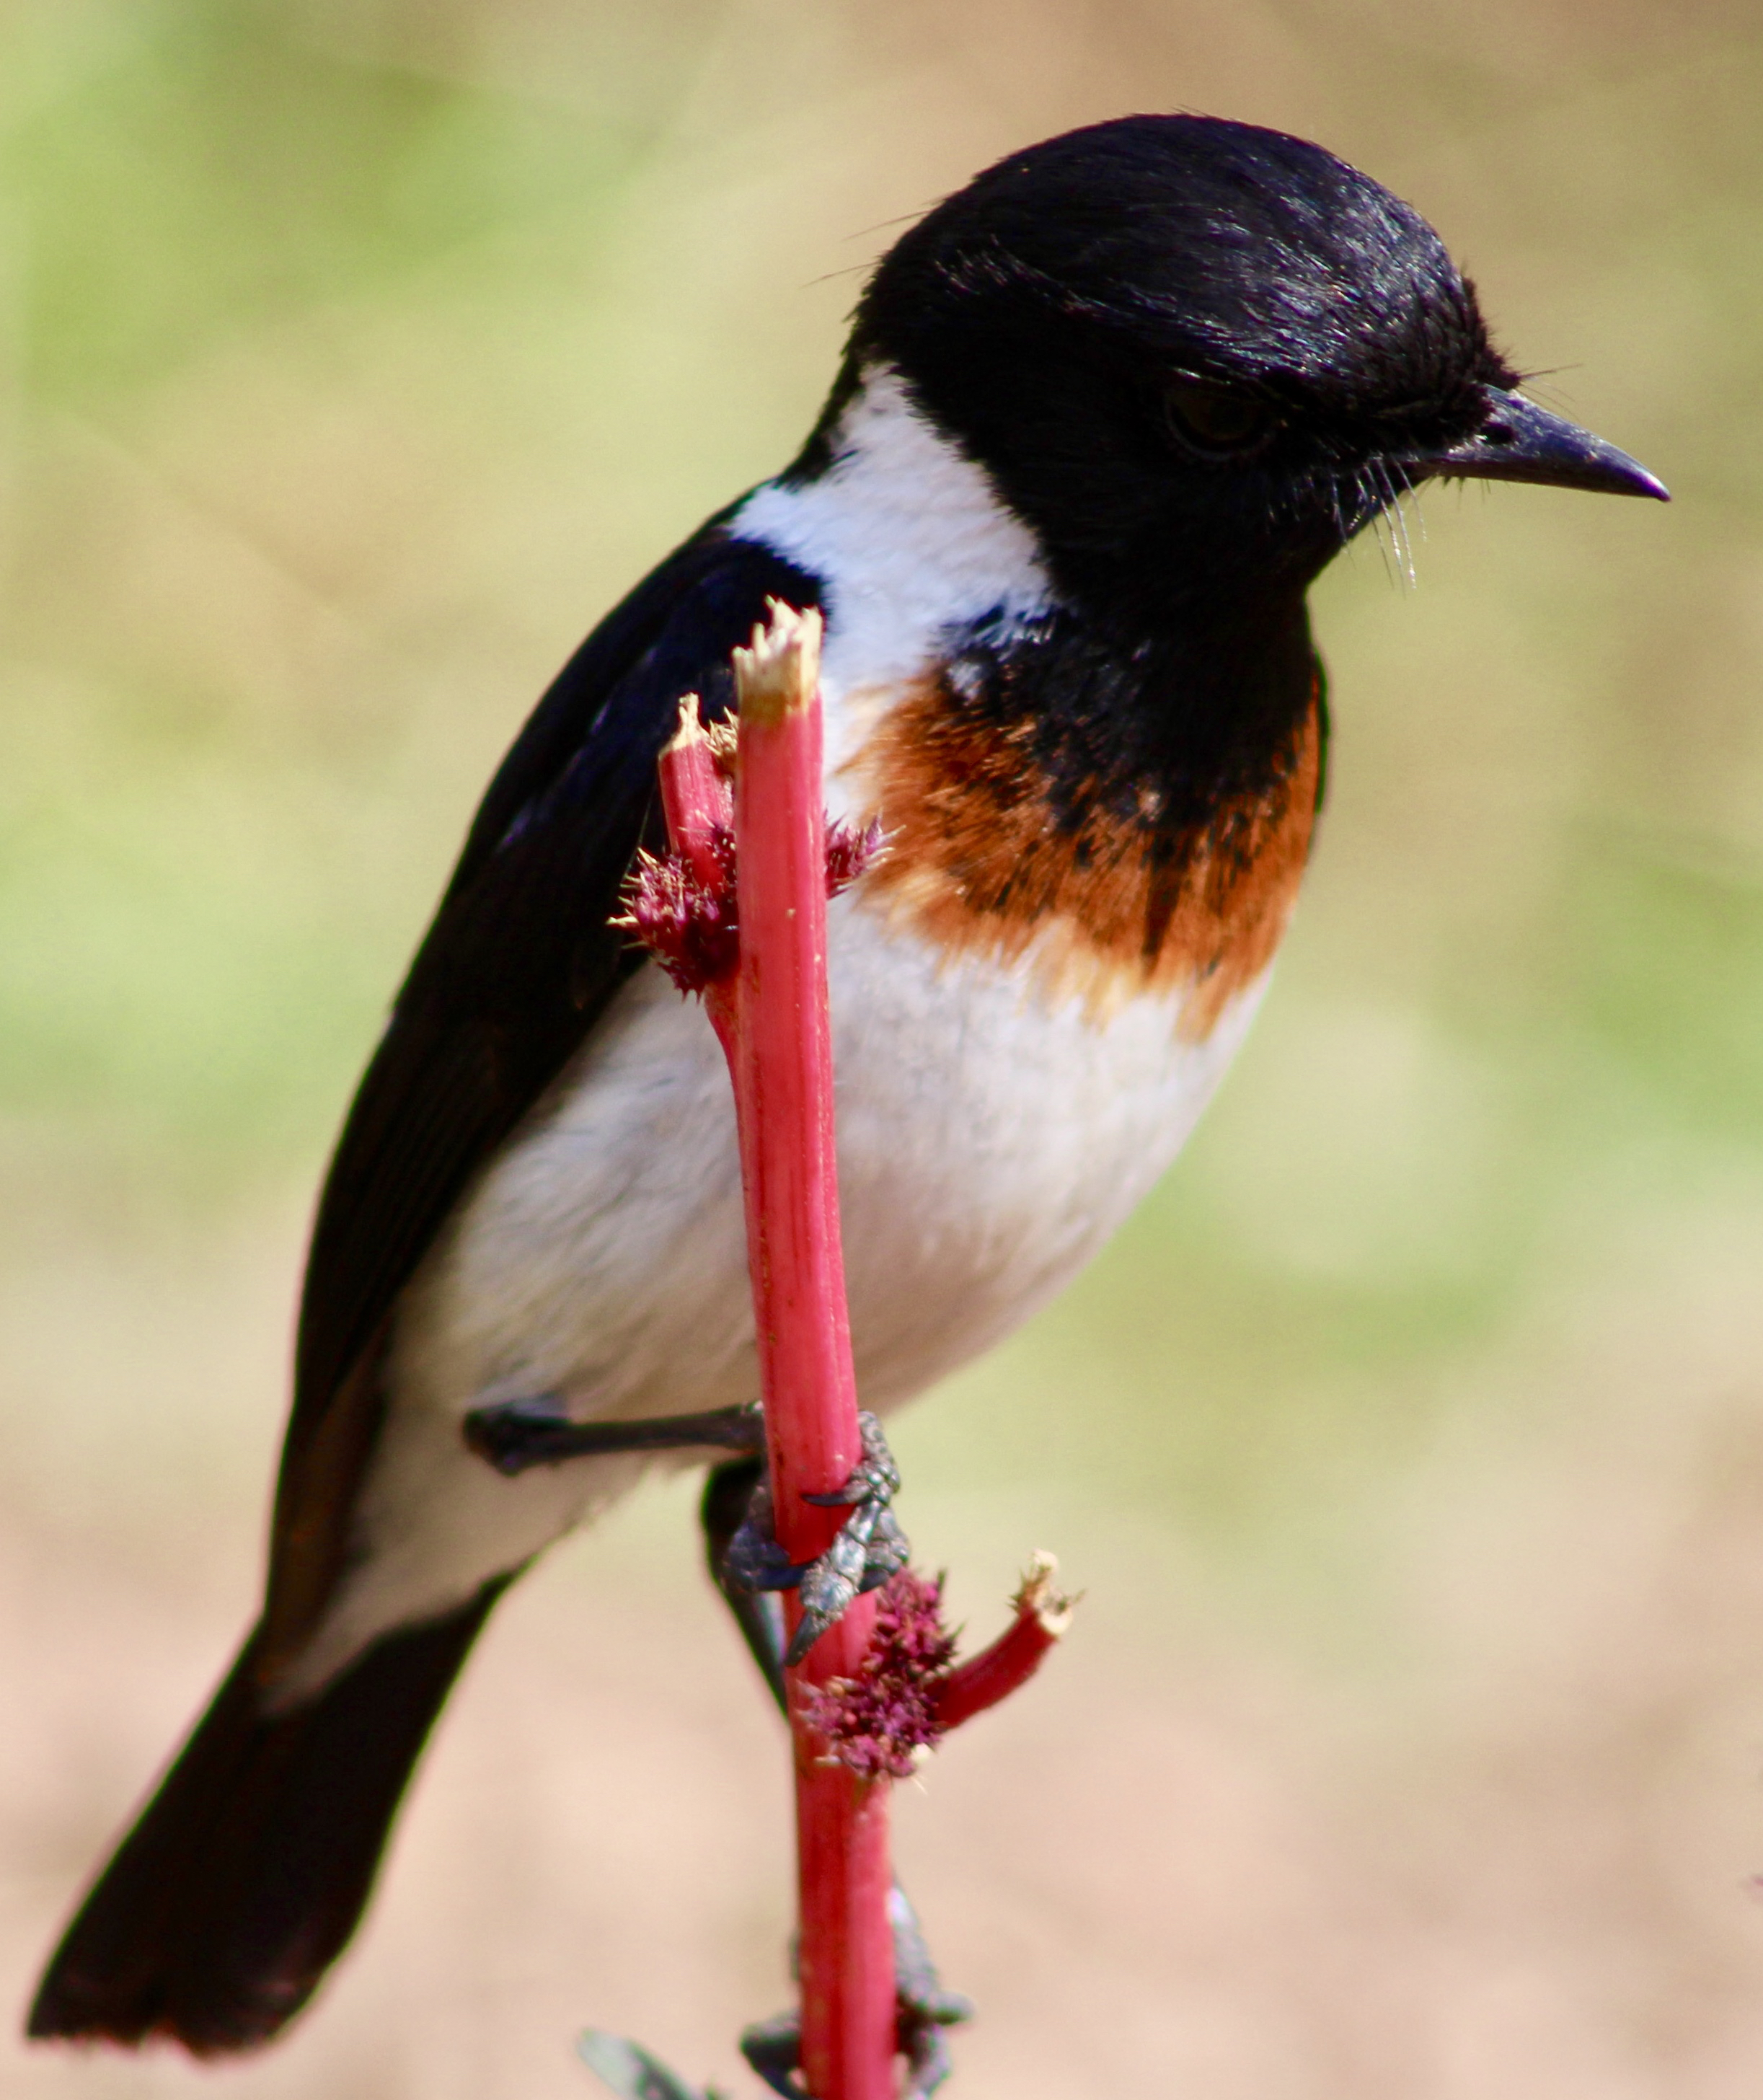 Kagera Safaris has made it onto the Ethical Bird Tours List 2018